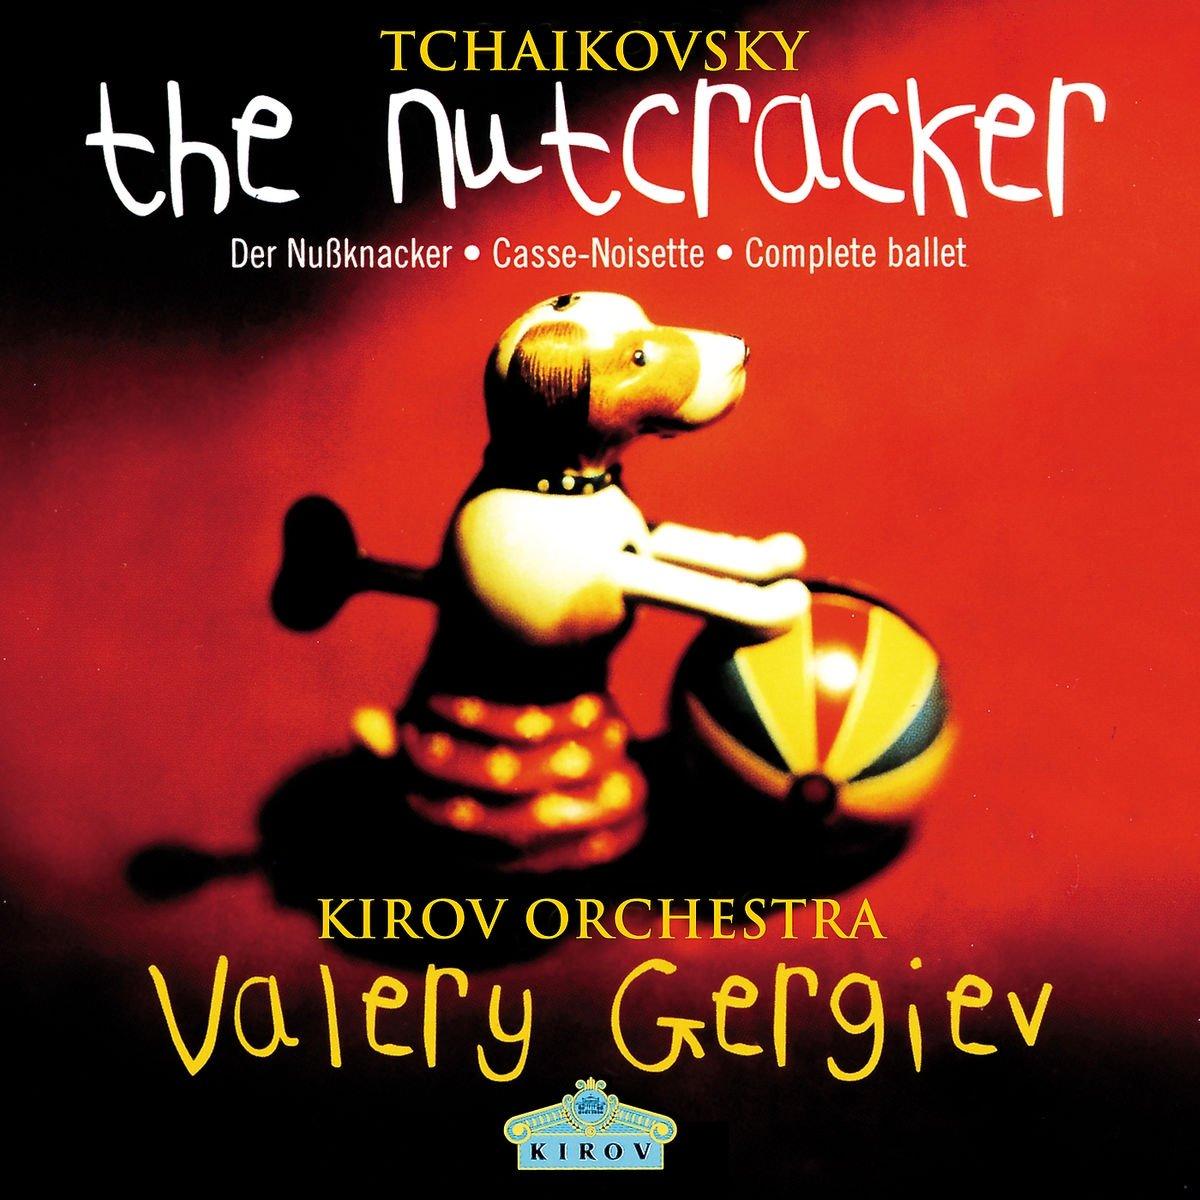 Nutcracker (Complete Ballet) - De notenkraker kopen